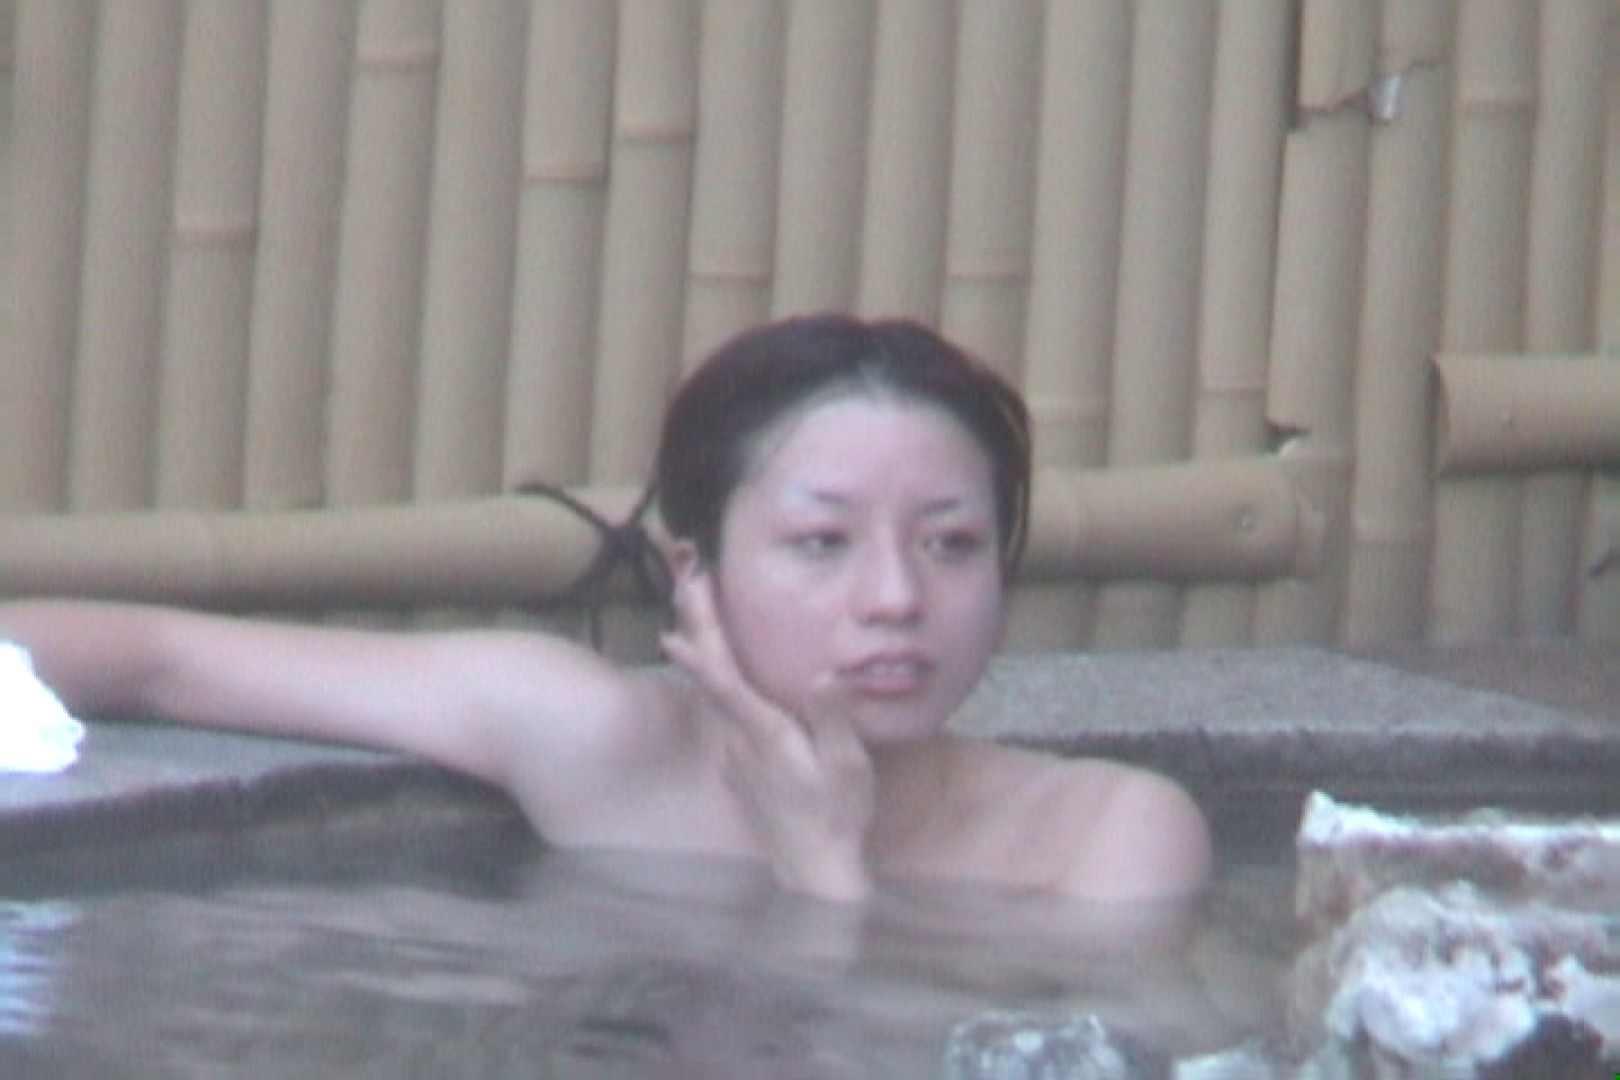 Aquaな露天風呂Vol.608 HなOL | 盗撮  89pic 70